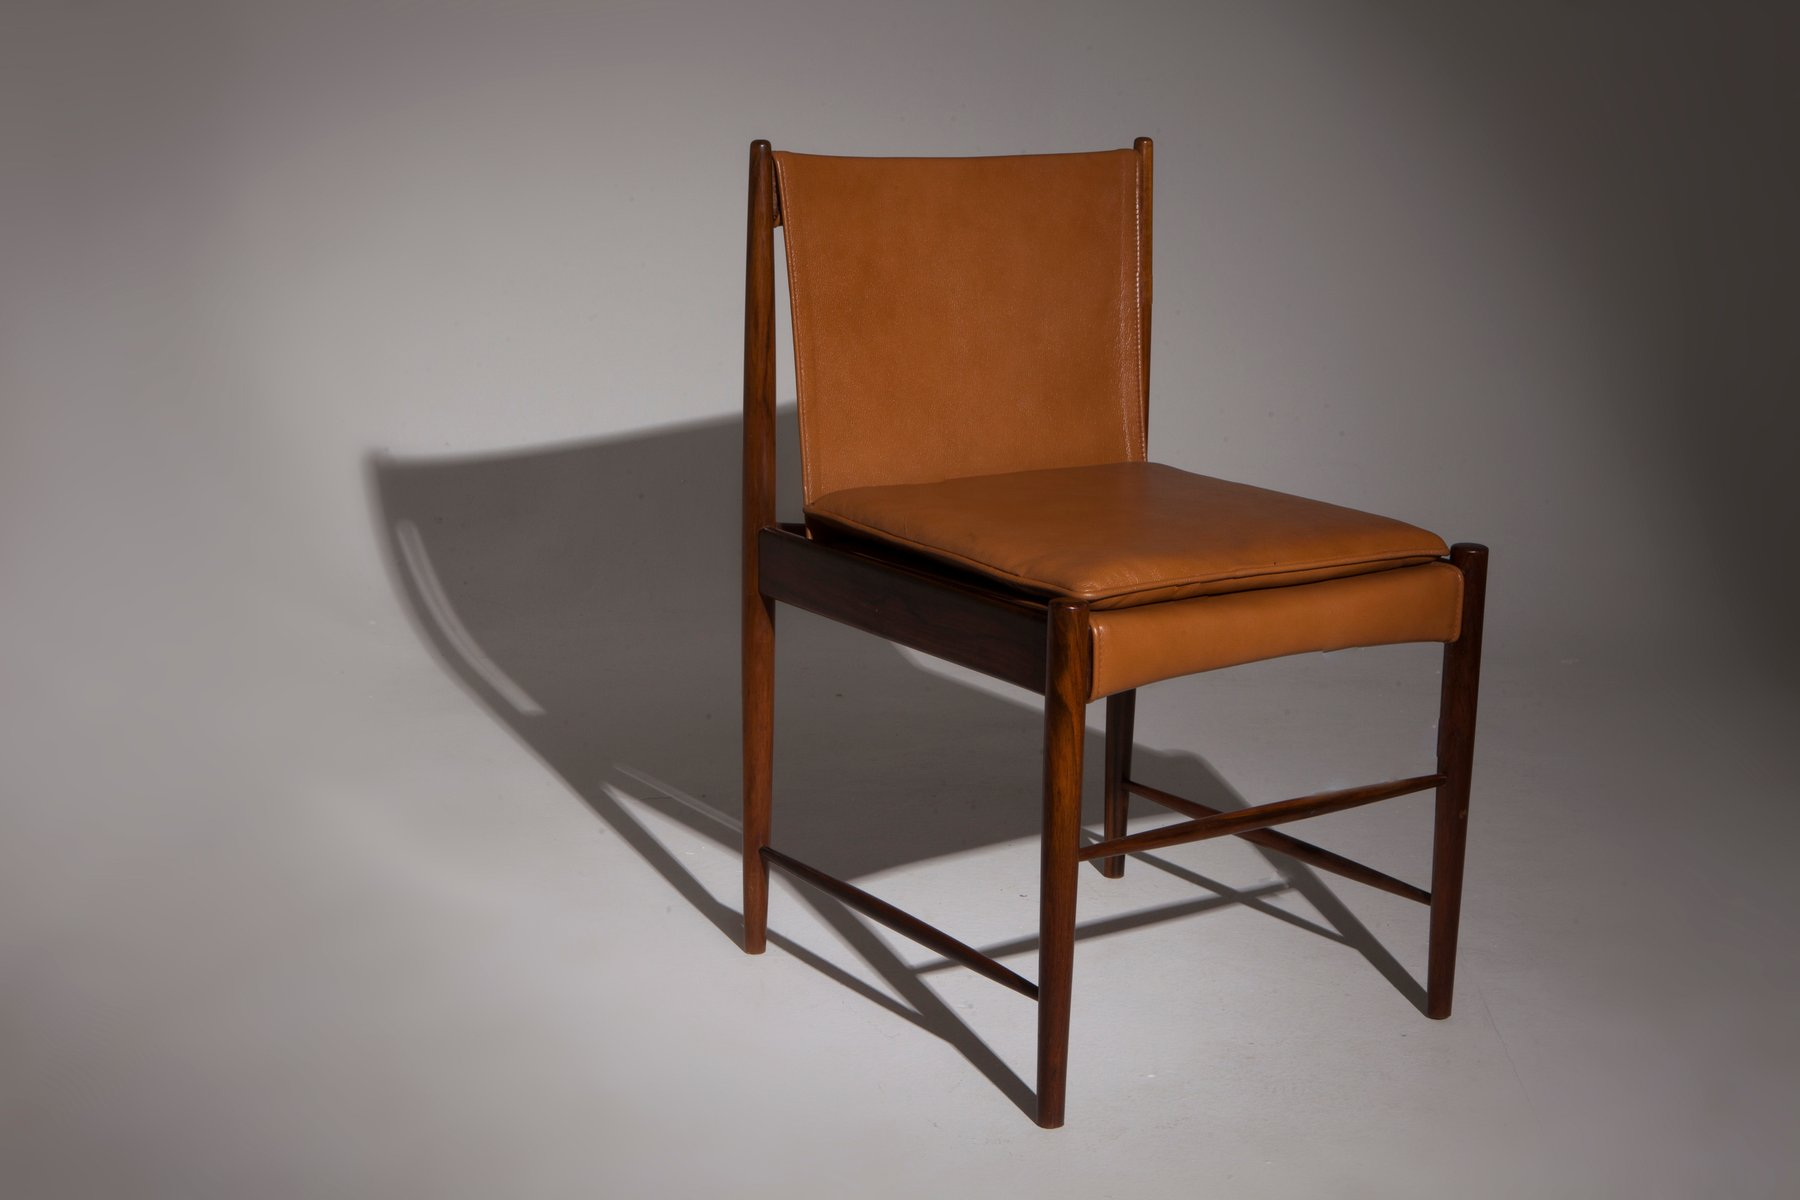 Chaises basses cantu par sergio rodrigues pour oca 1949 for Chaise basse design